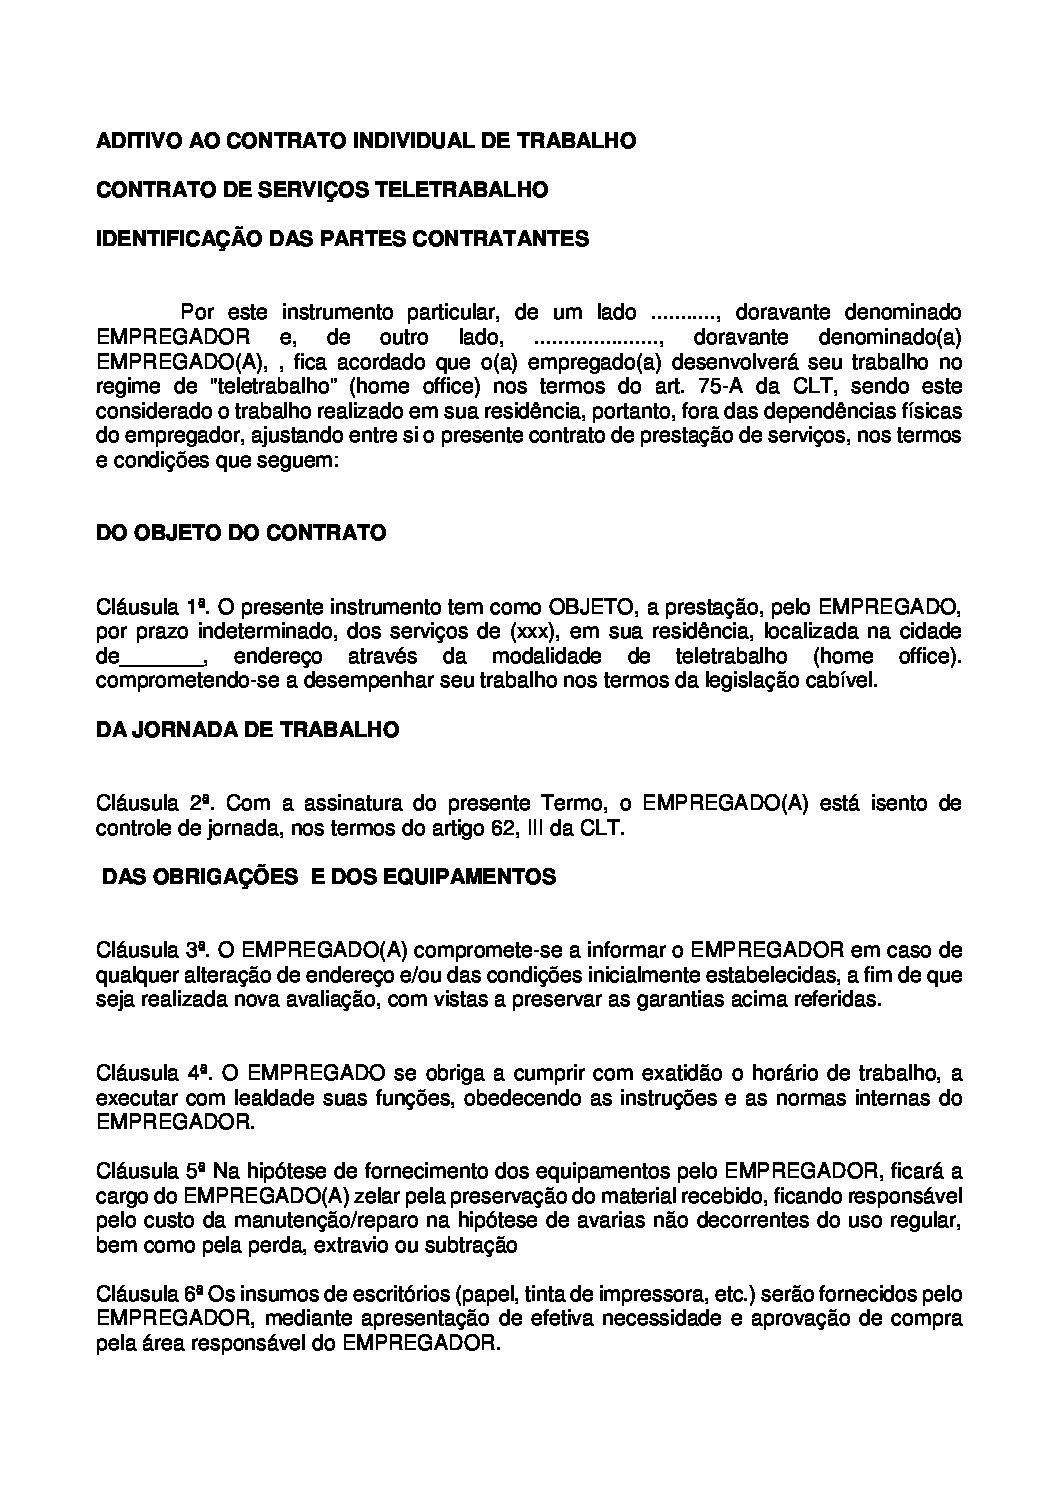 Aditivo de Contrato de Home Office – Teletrabalho